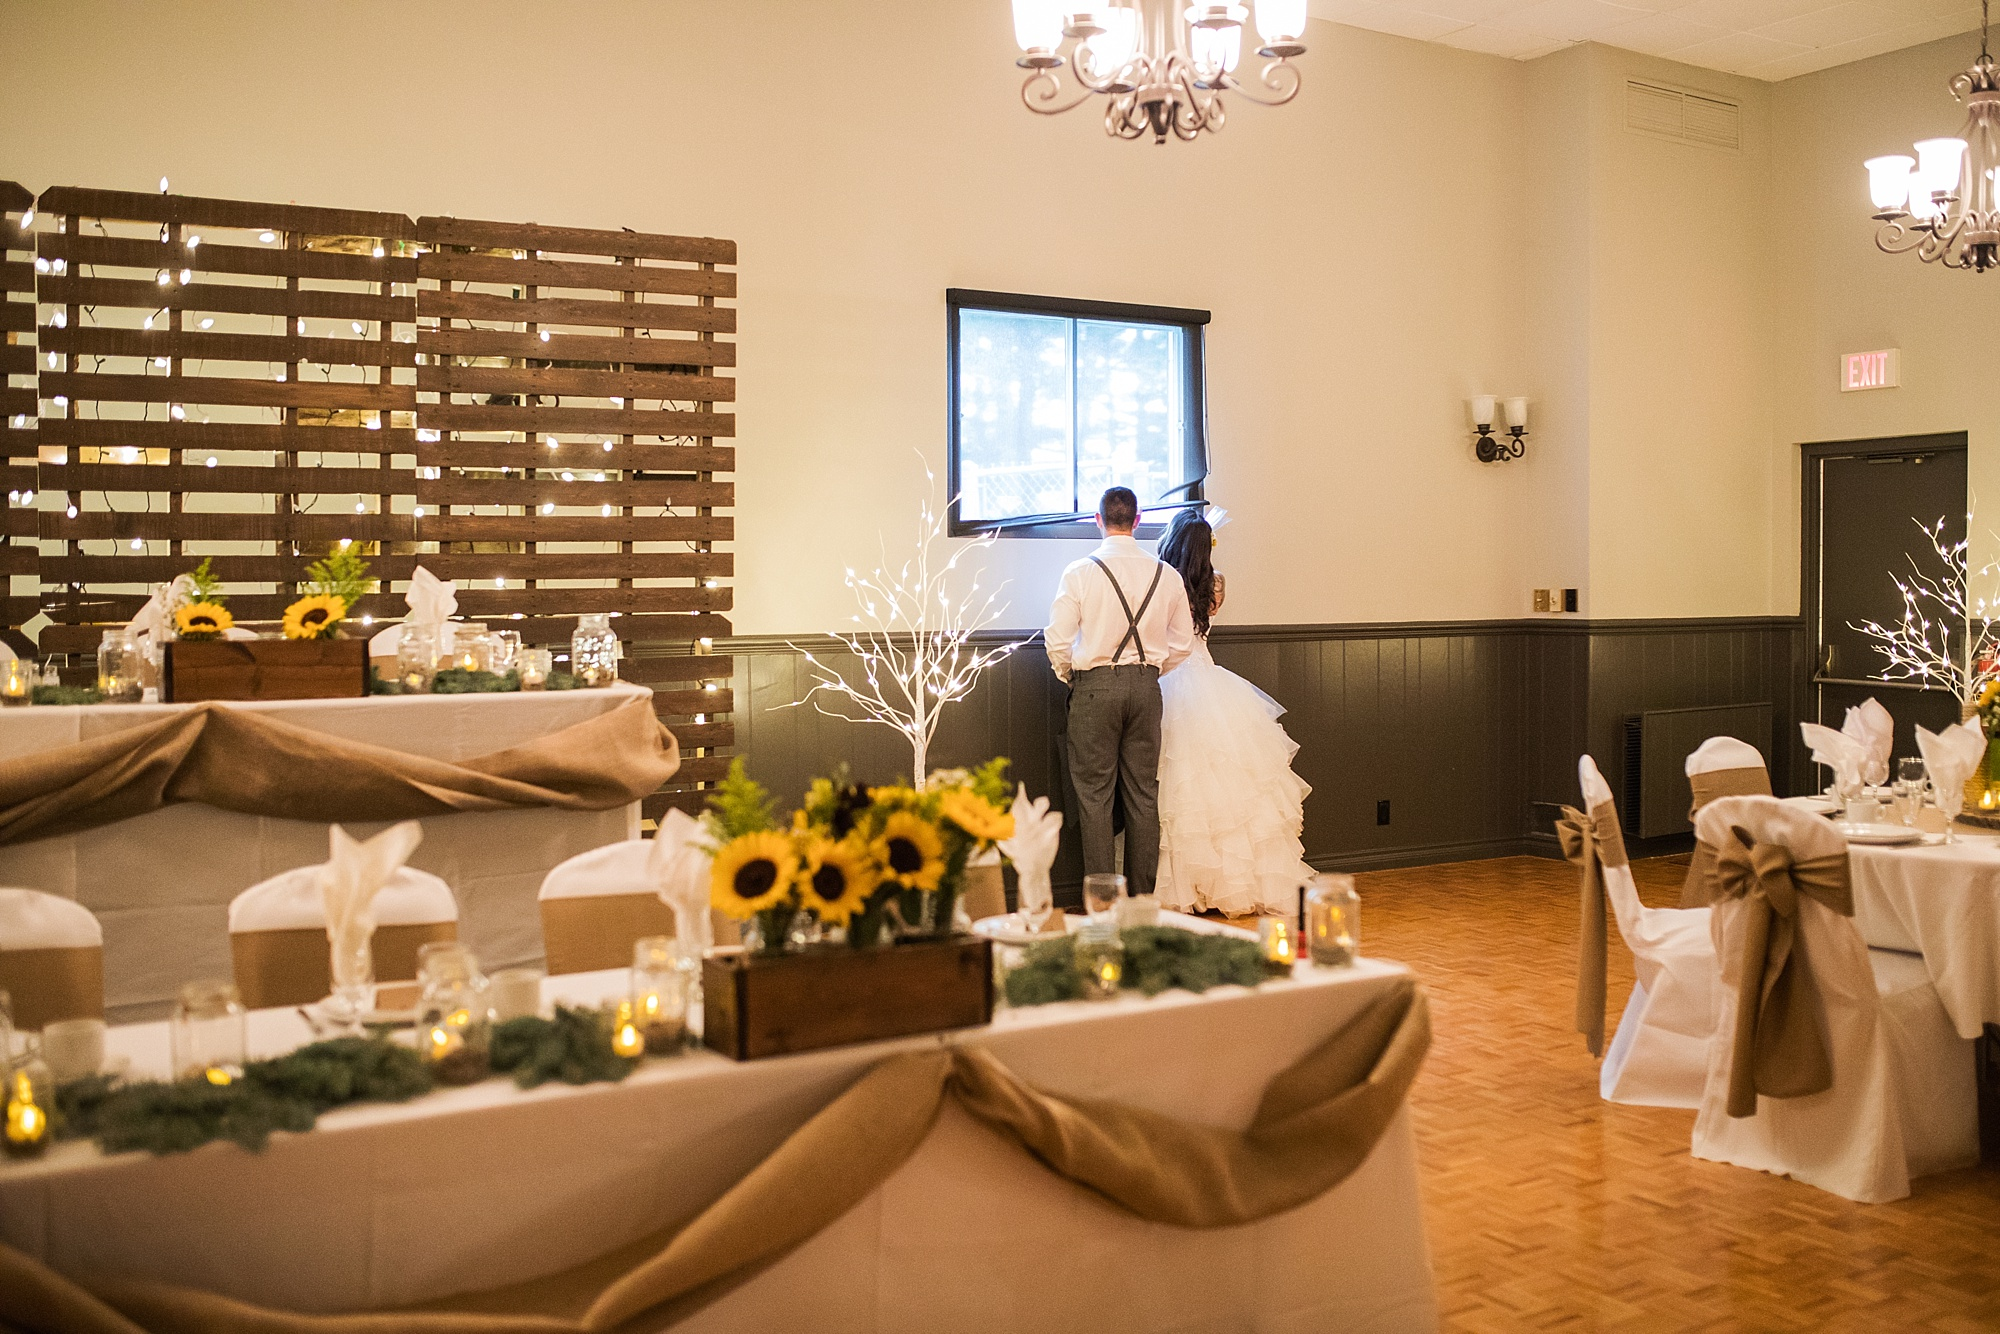 lipapark-hernderwinery-wedding_0075.jpg